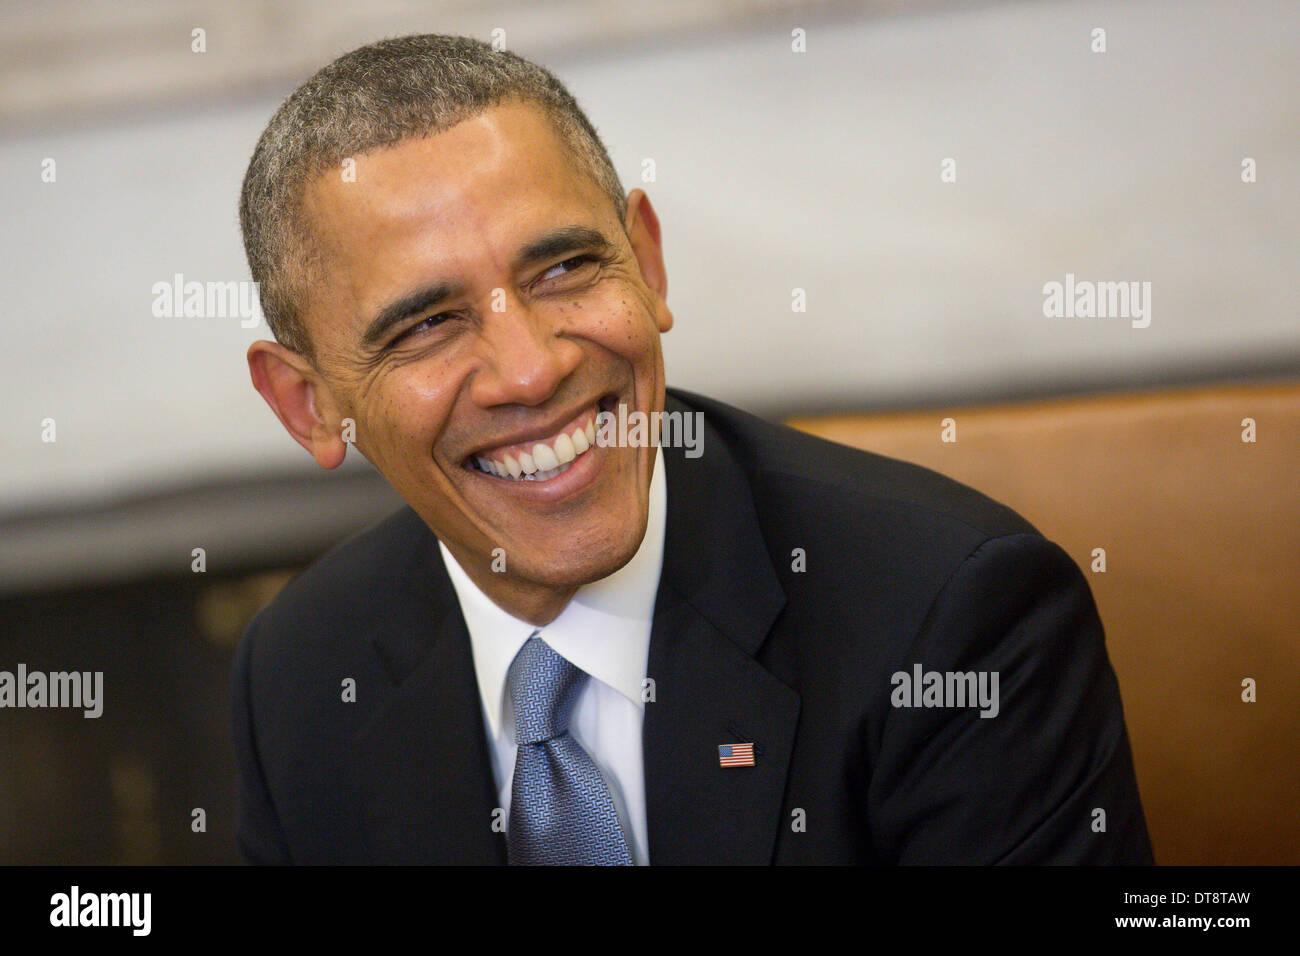 Washington DC, USA. 11th Feb, 2014. United States President Barack Obama smiles while meeting with President Francois Stock Photo